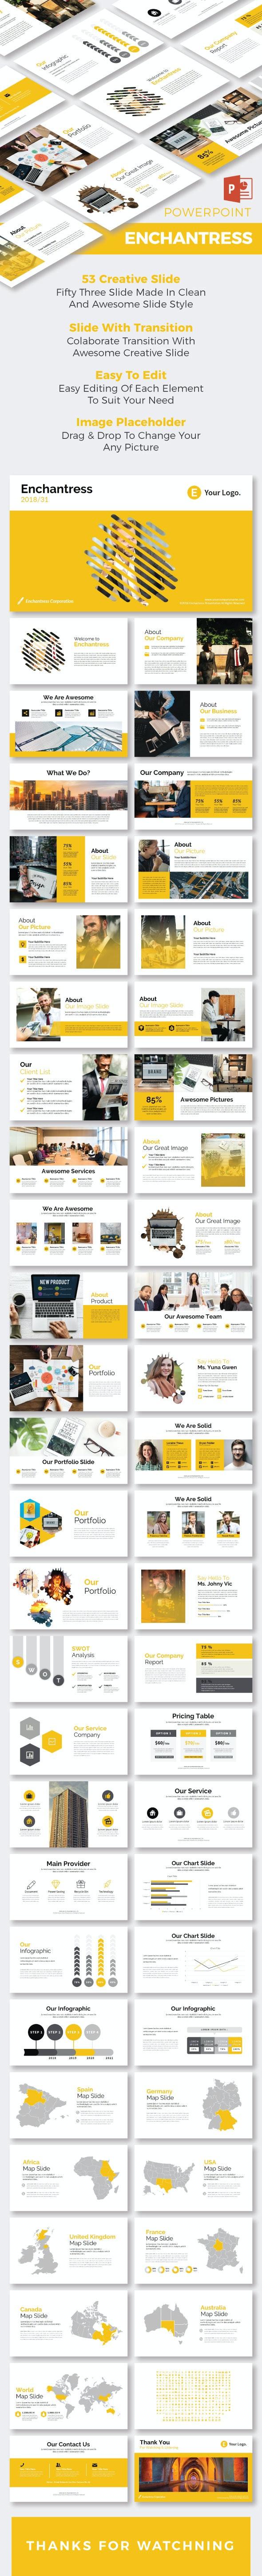 Enchantress PowerPoint Temp - Business PowerPoint Templates